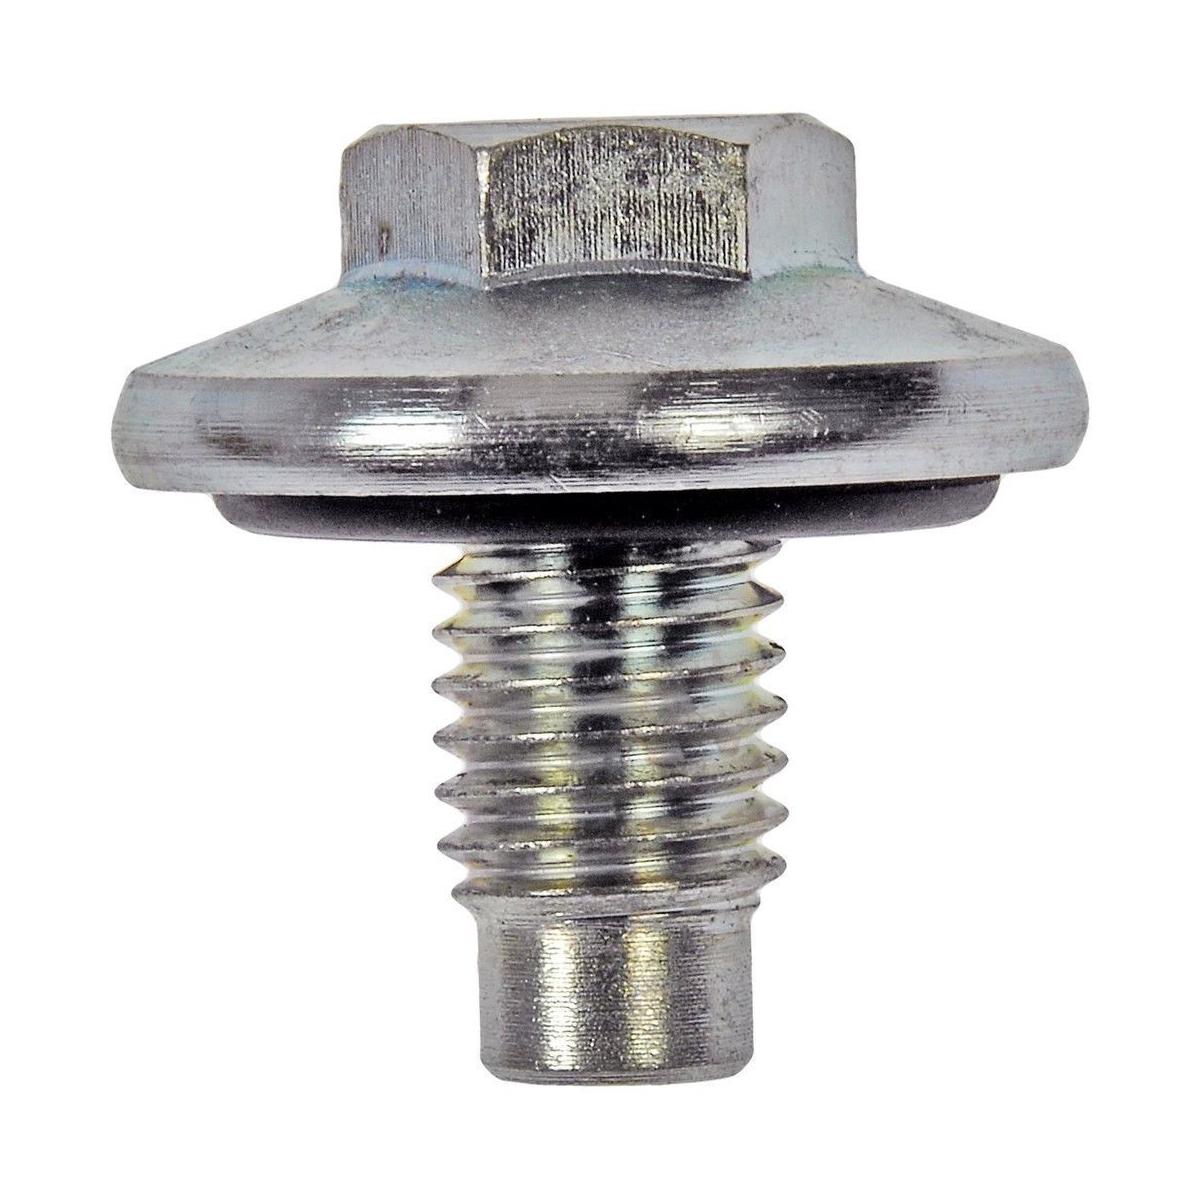 Allison Automatic Transmission Fluid Pan Drain Plug for GM #24233099